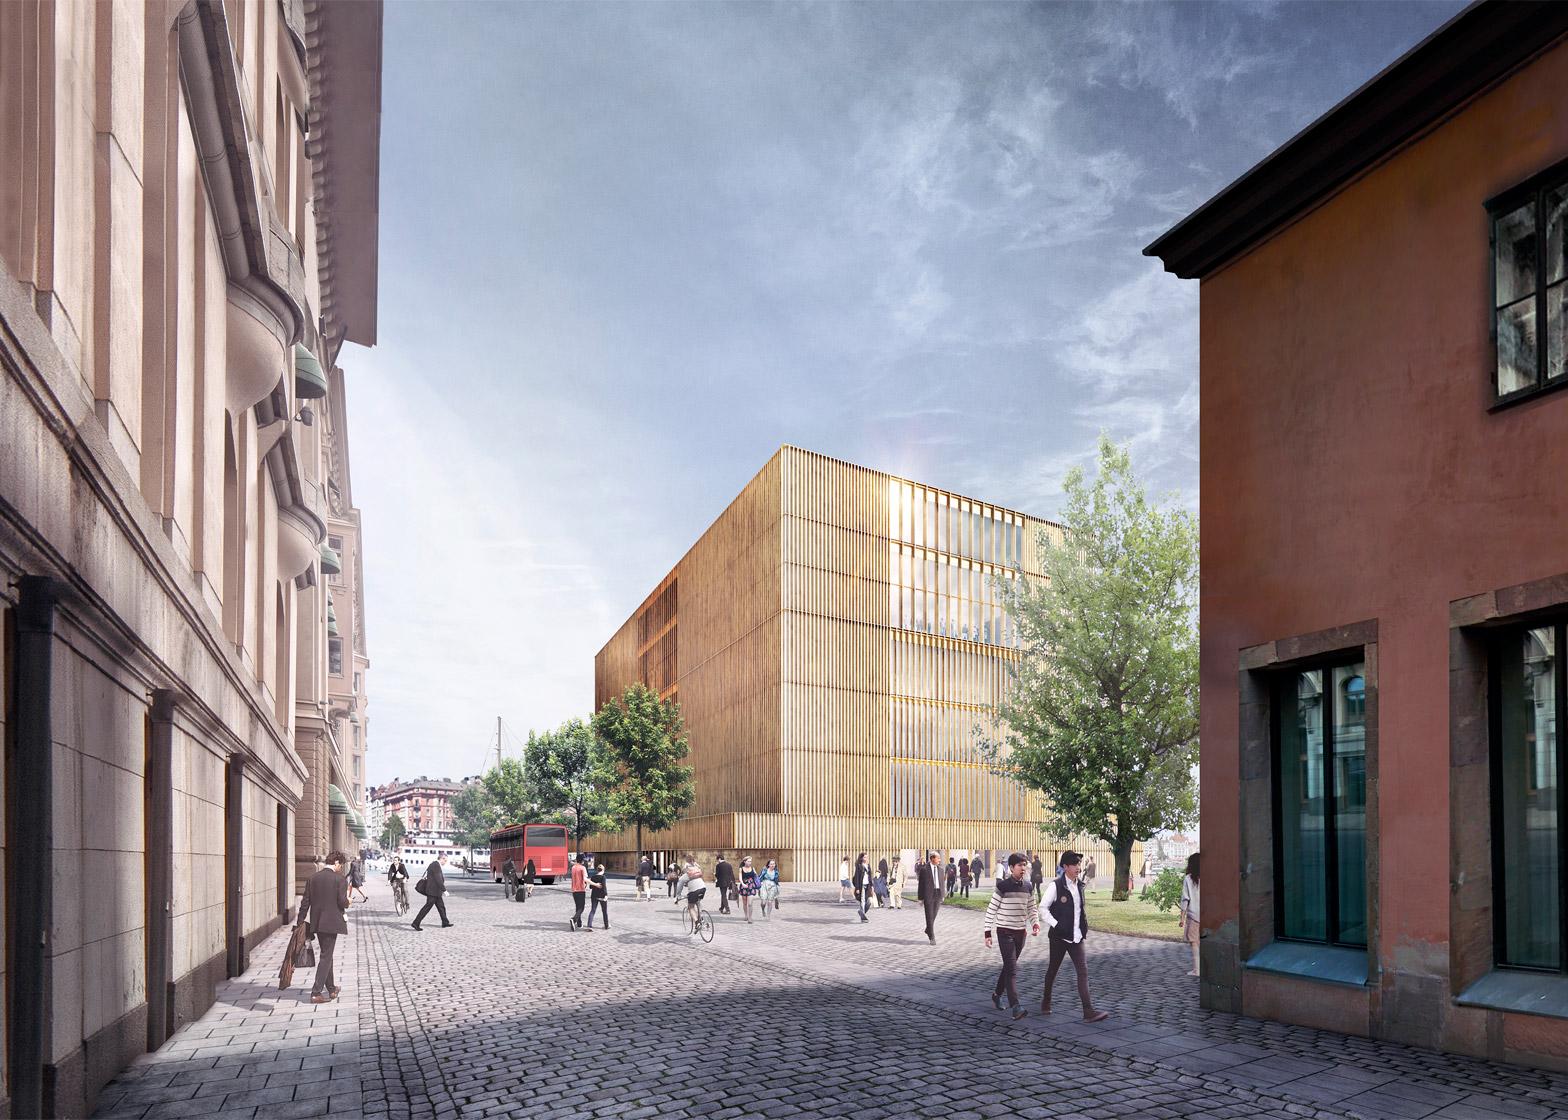 Nobel Center by David Chipperfield